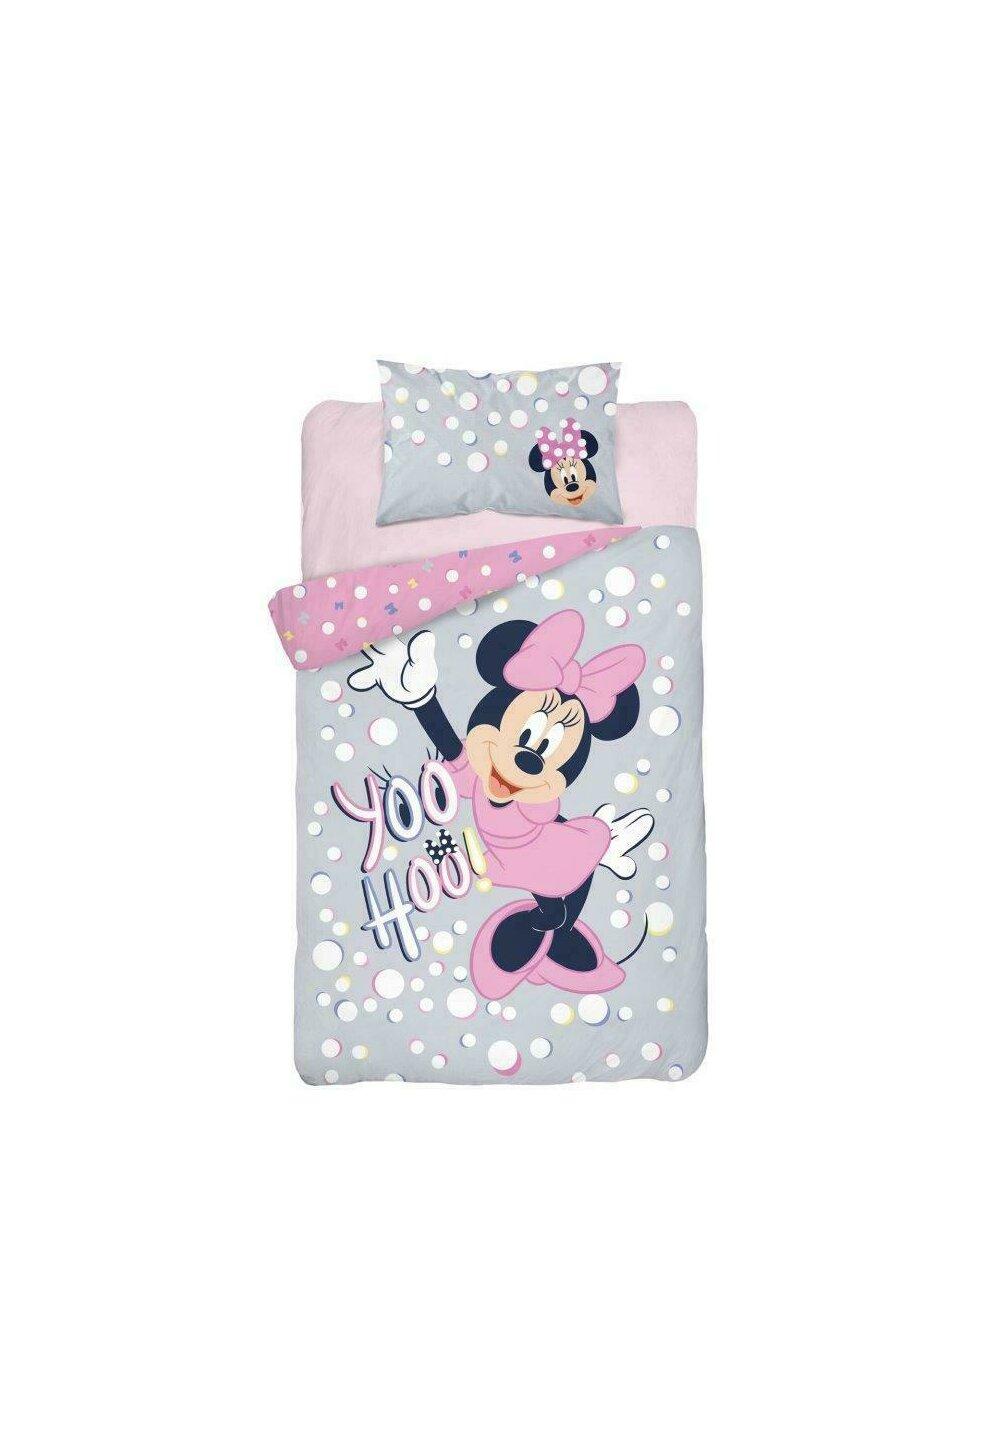 Lenjerie pat, Minnie Mouse, yoo hoo, gri cu roz, 100x135 cm imagine